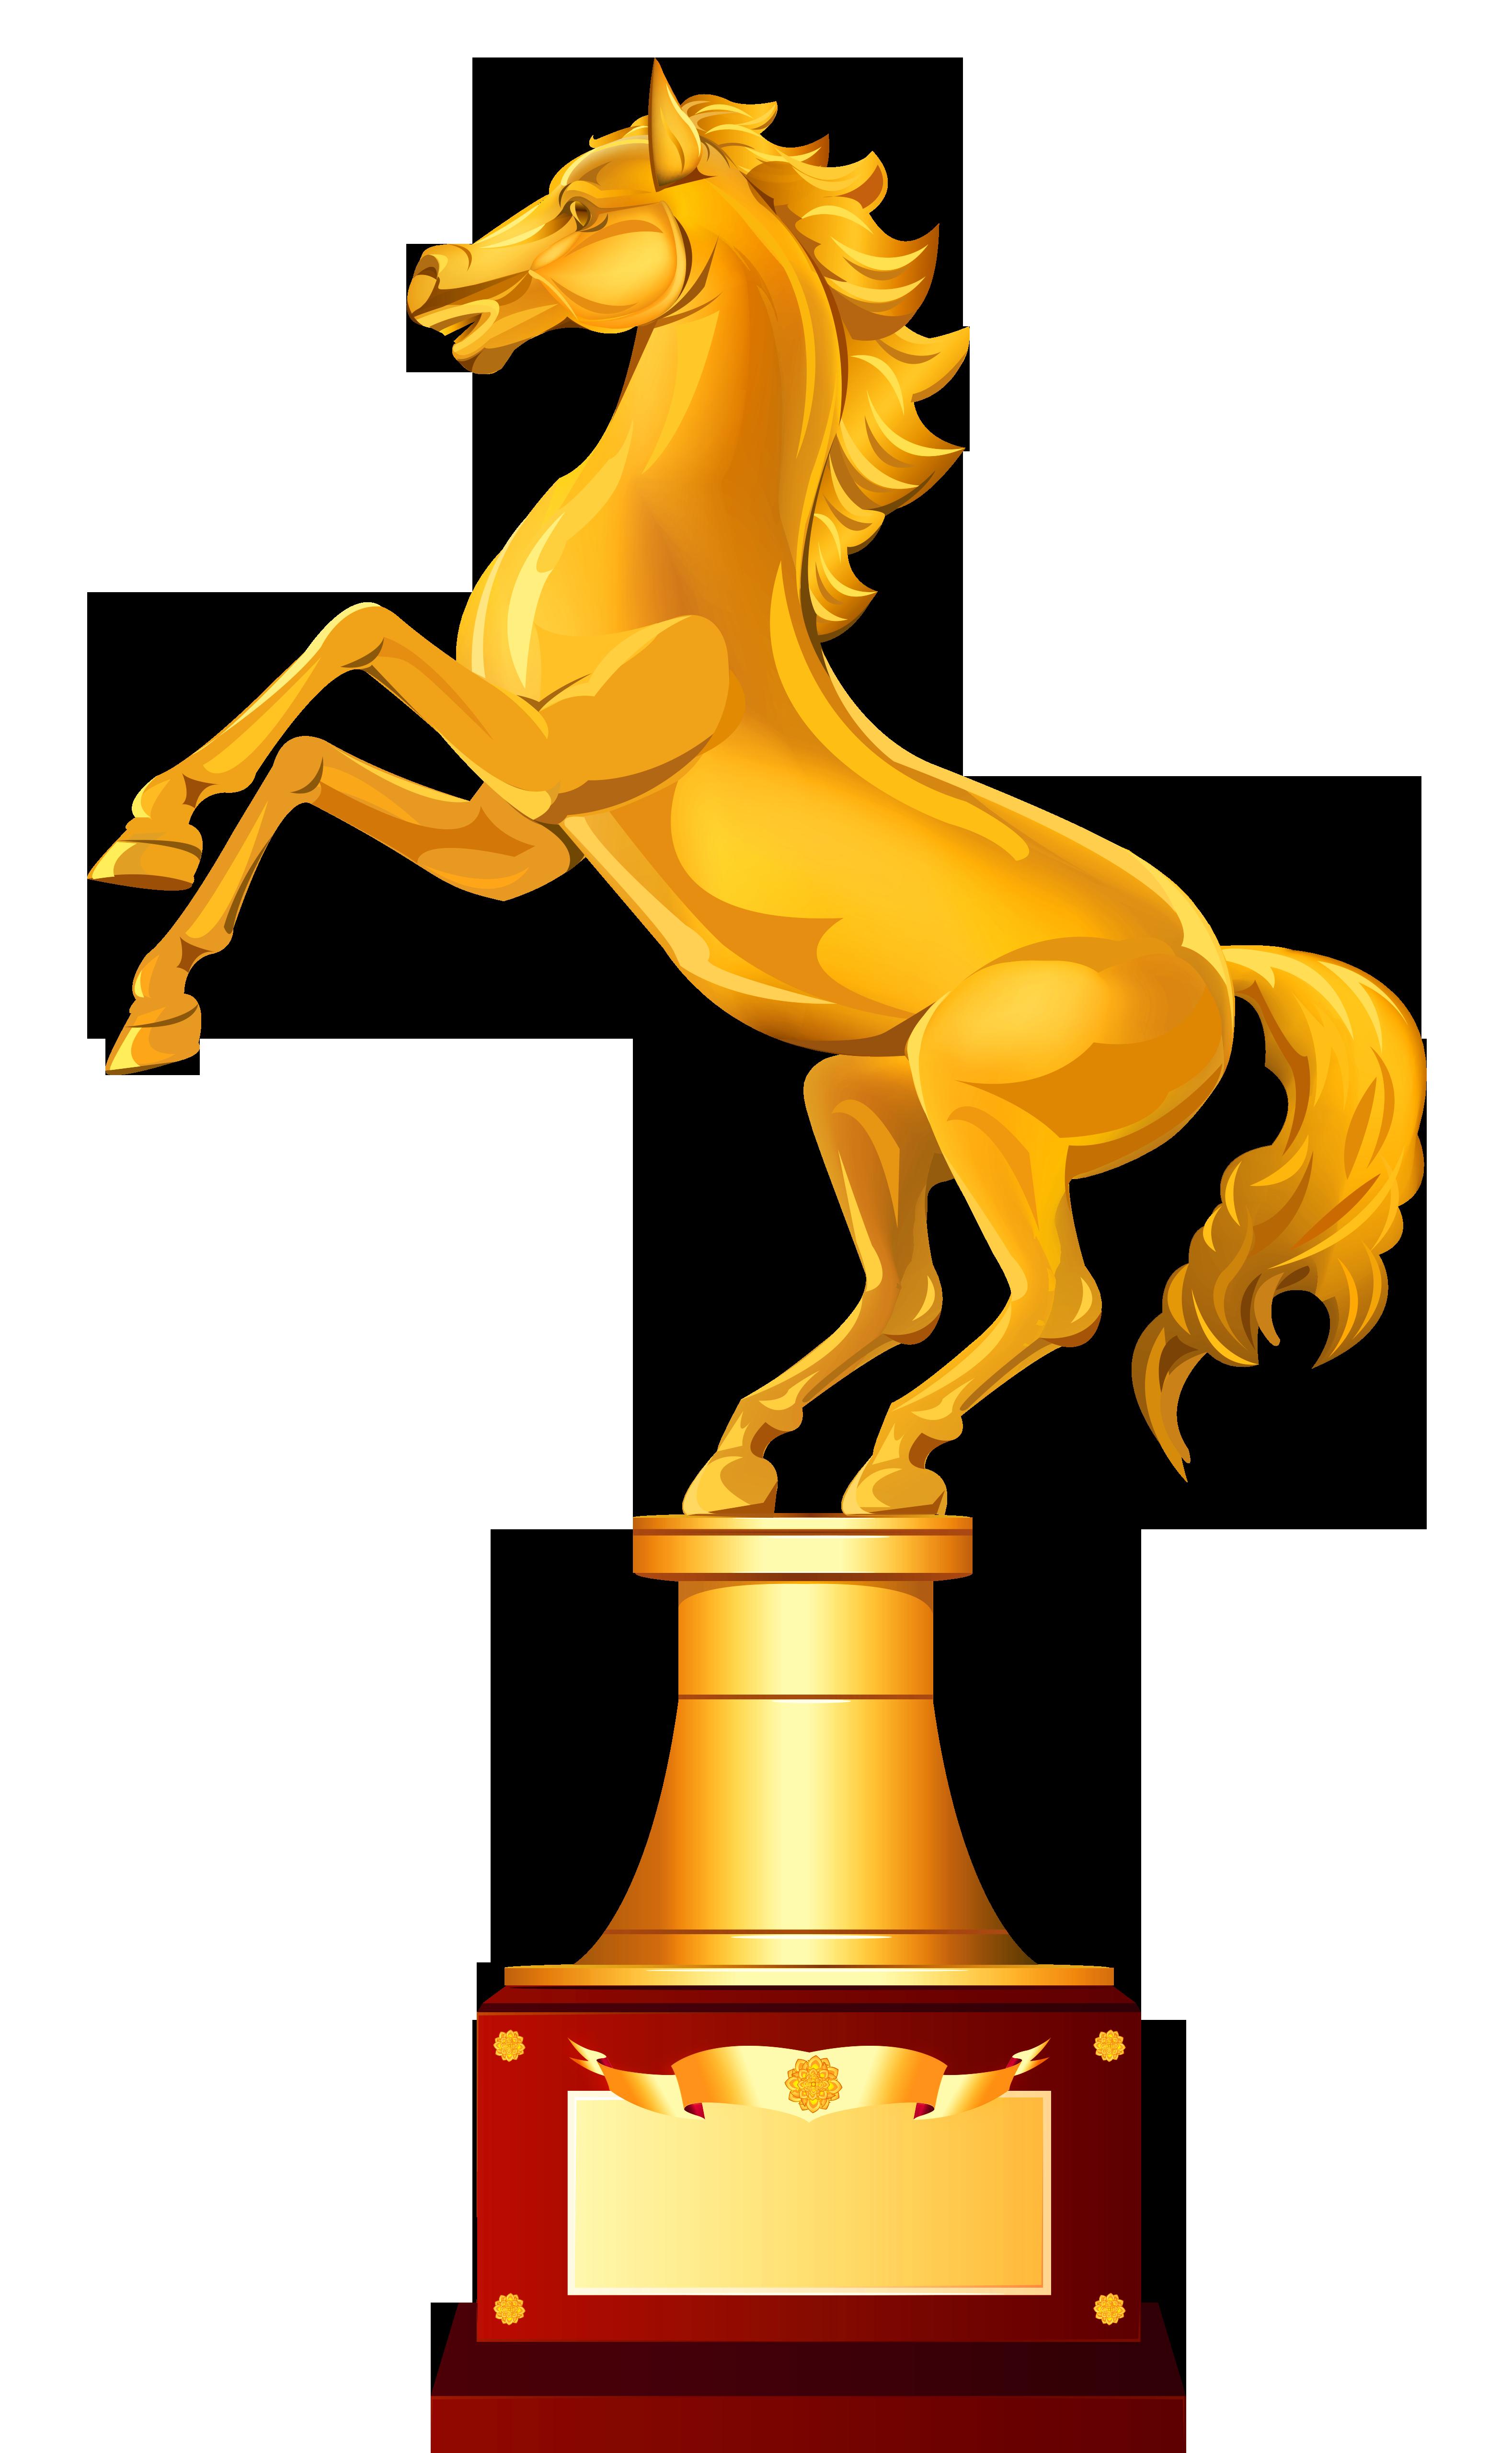 golden horse trophy clipart image